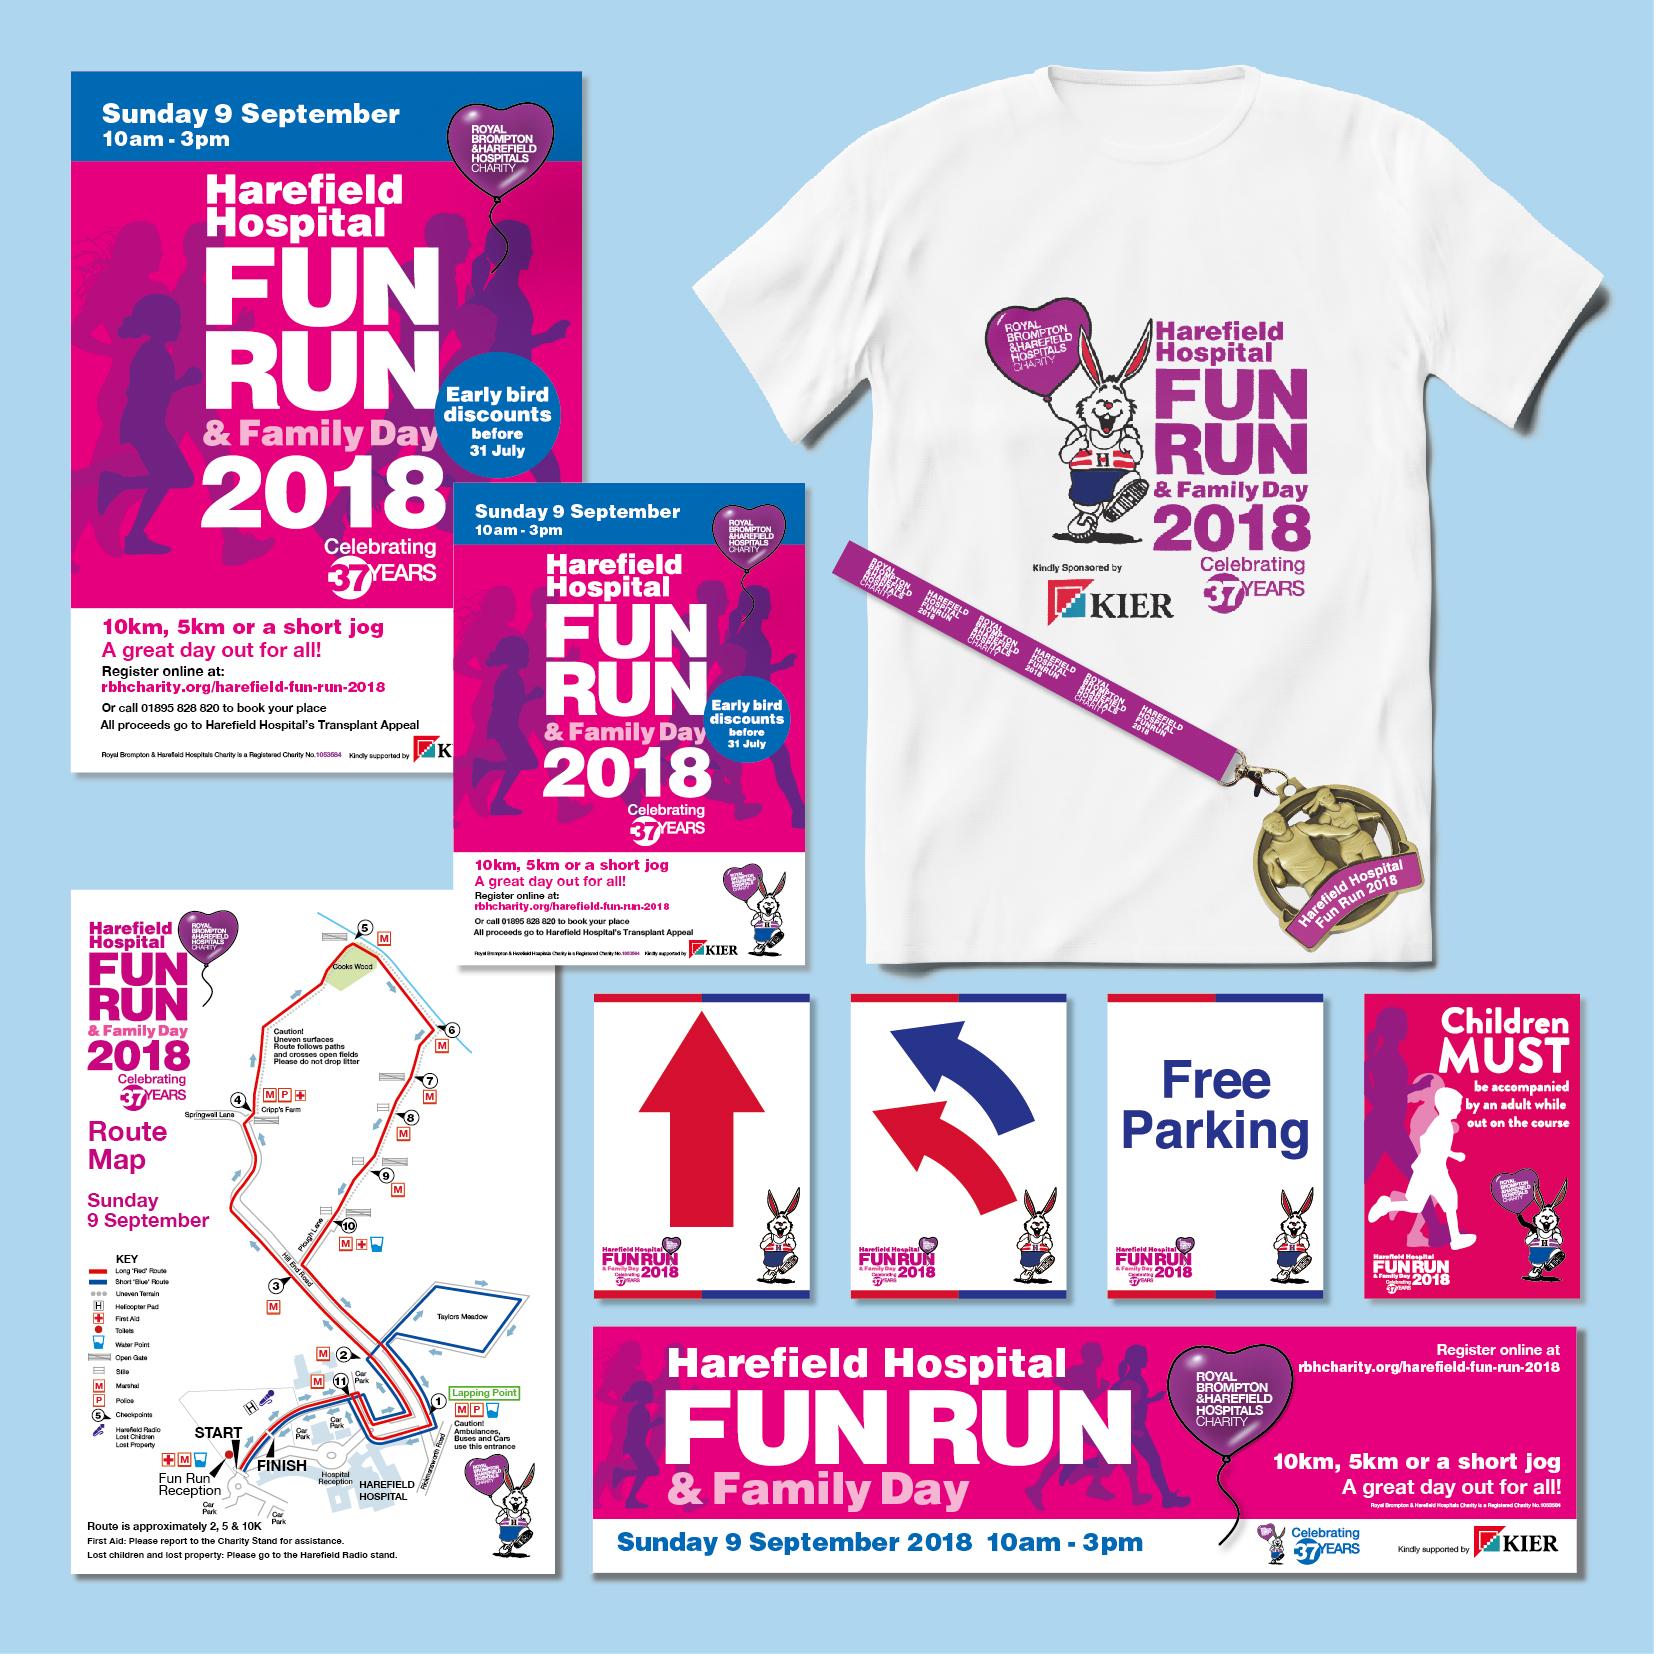 RBHHC Fun Run Event Branding